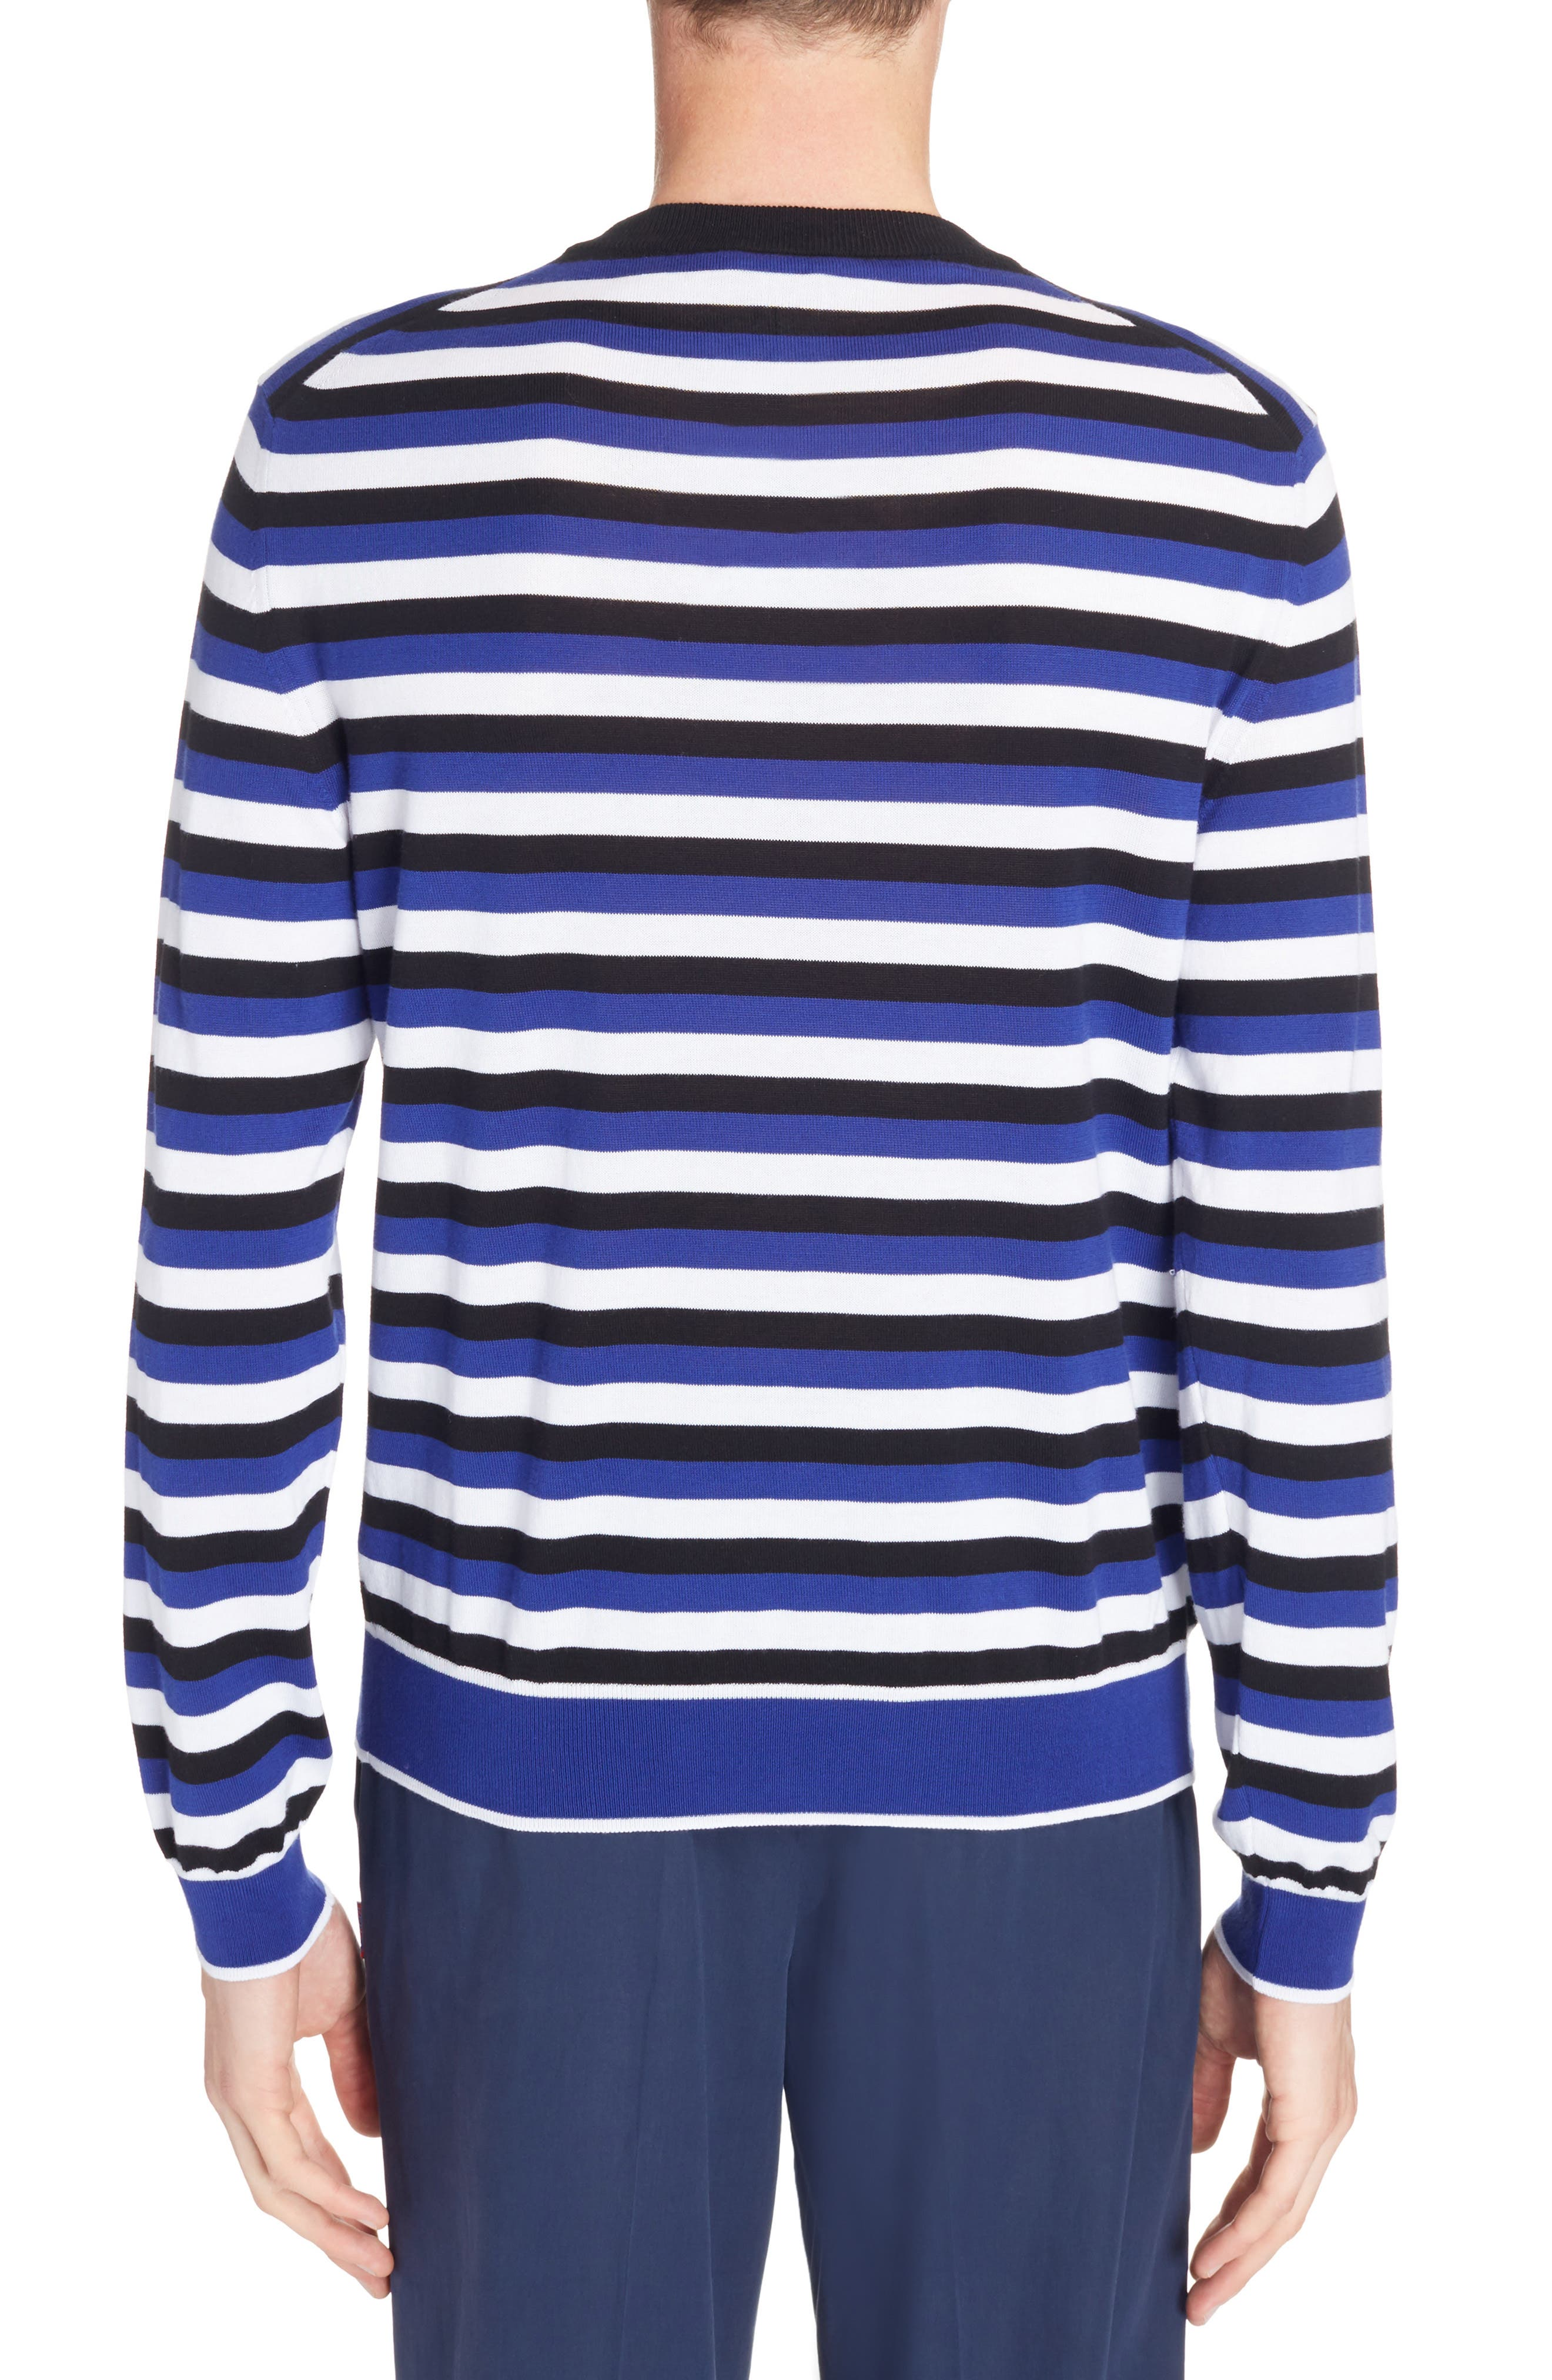 Large K Stripe Sweater,                             Alternate thumbnail 2, color,                             422